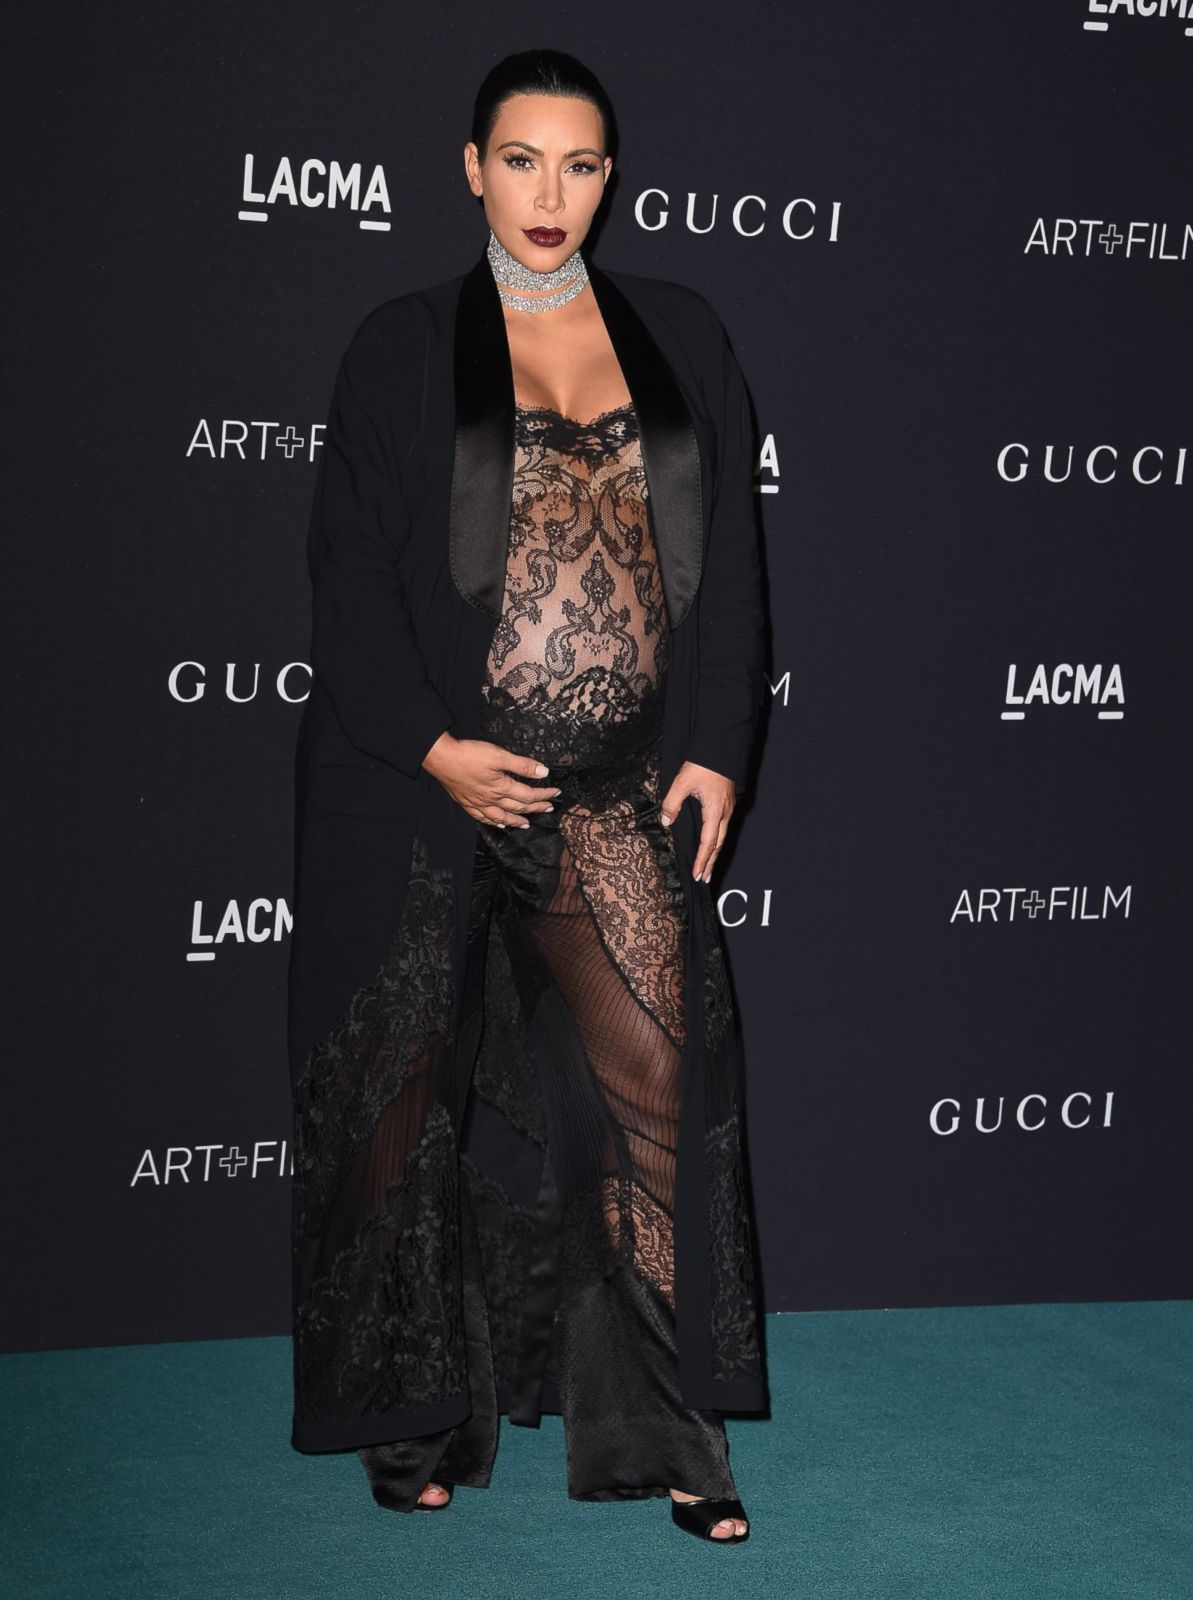 Pregnant Kim Kardashian Goes Sheer On The Red Carpet